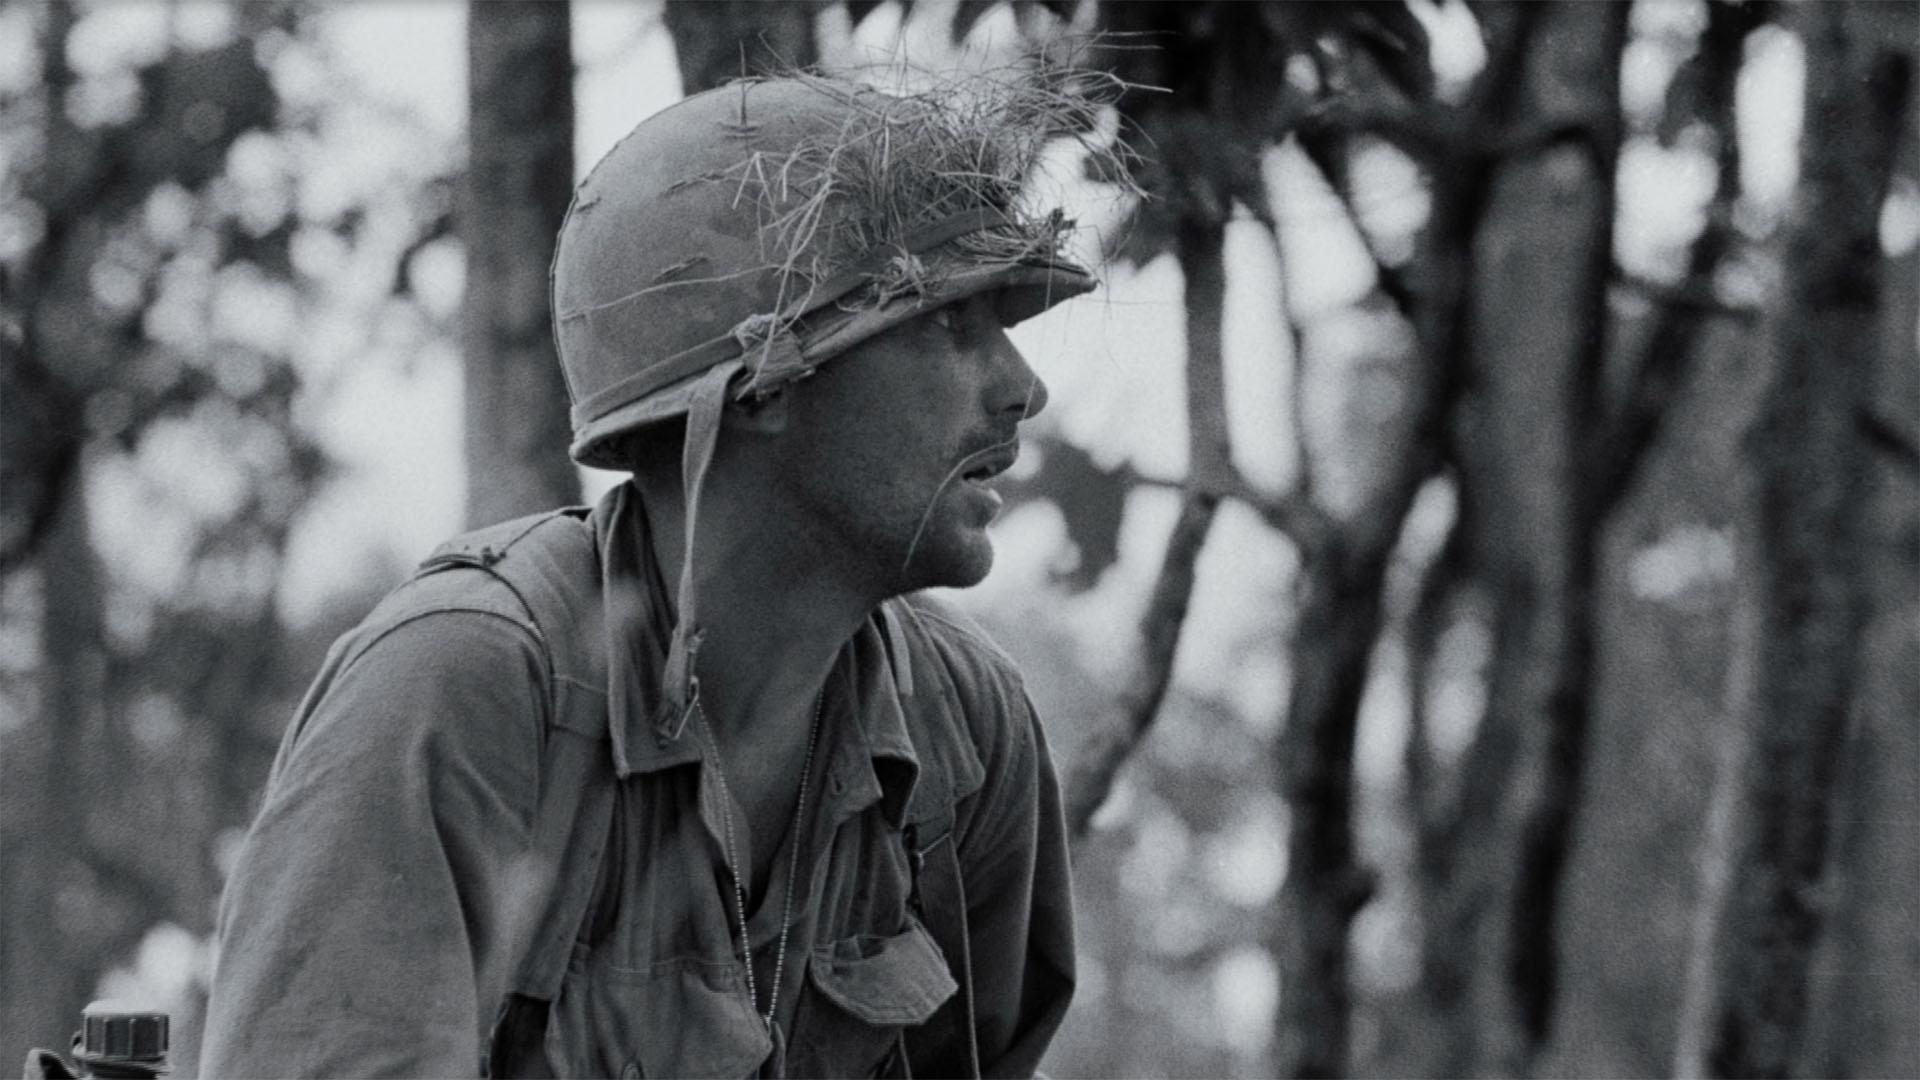 The Vietnam War | The River Styx